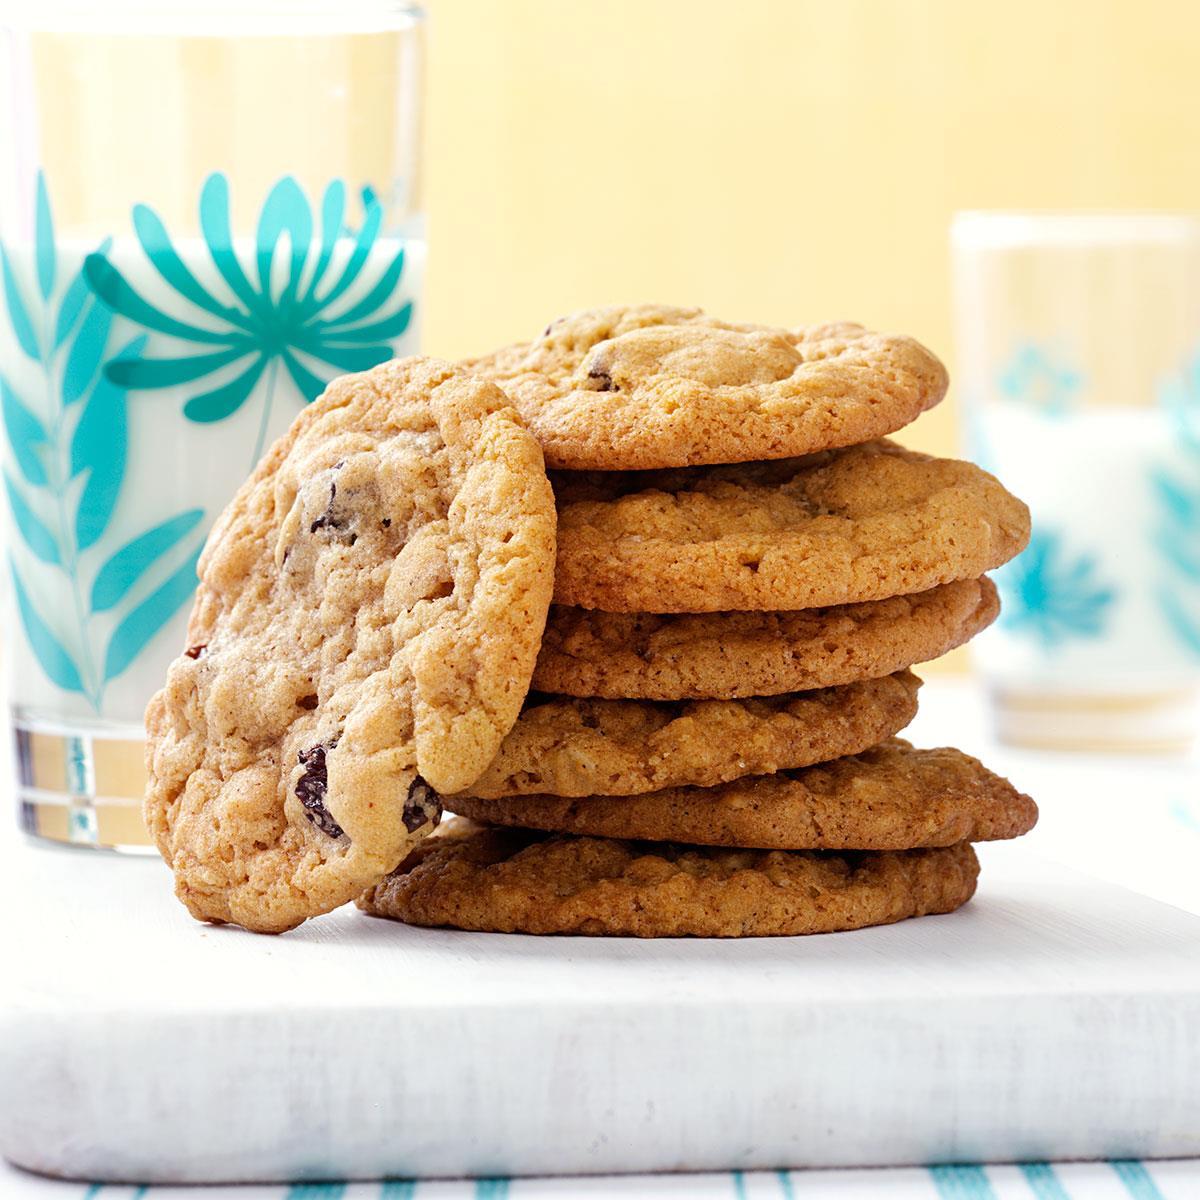 Oatmeal Raisin Cookies image